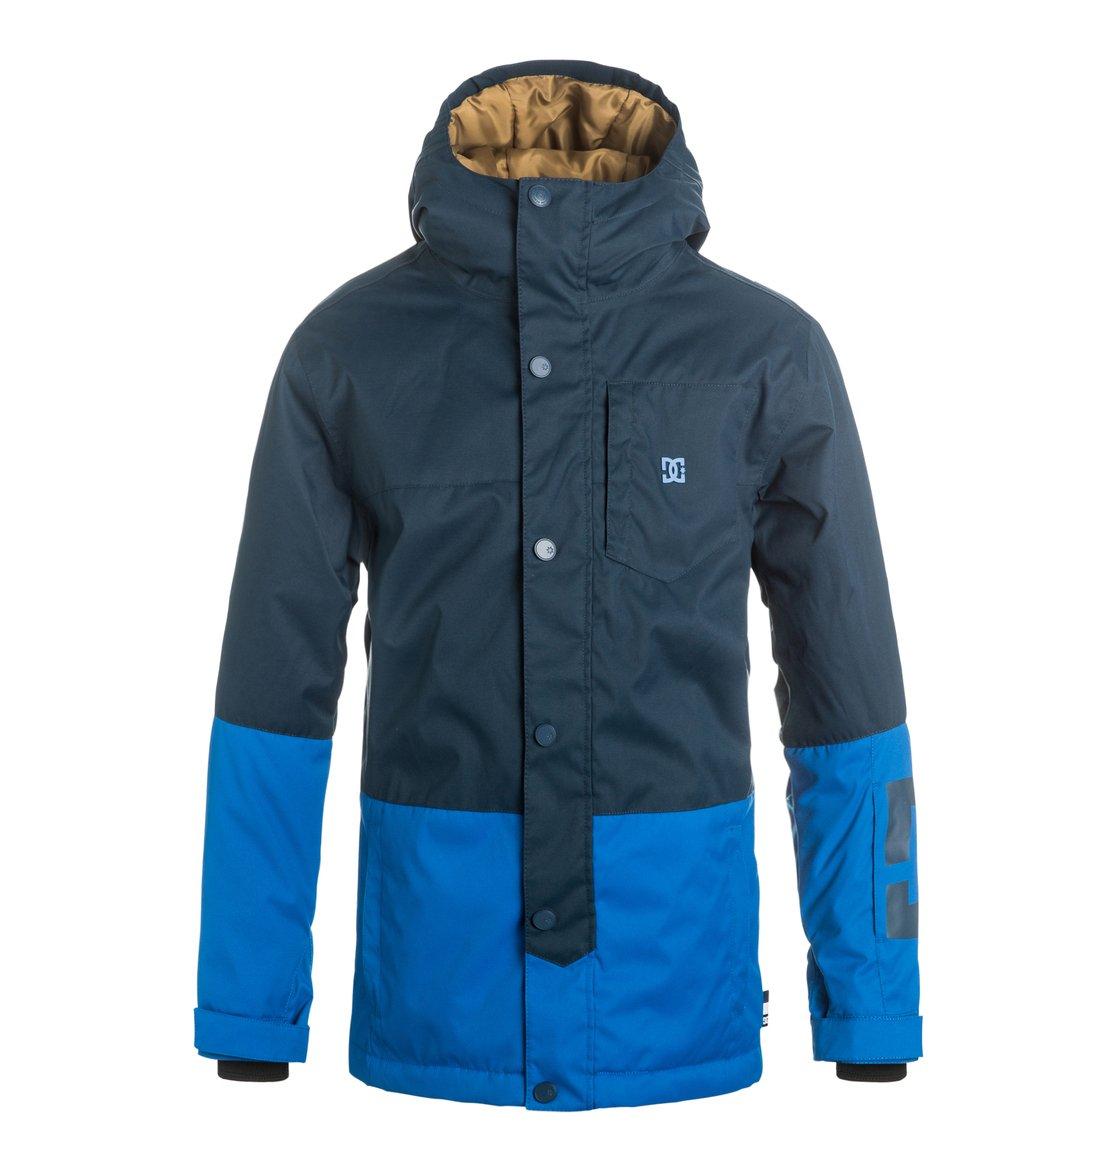 07516c0496c9 0 Boy s 8-16 Defy Snow Jacket EDBTJ03013 DC Shoes